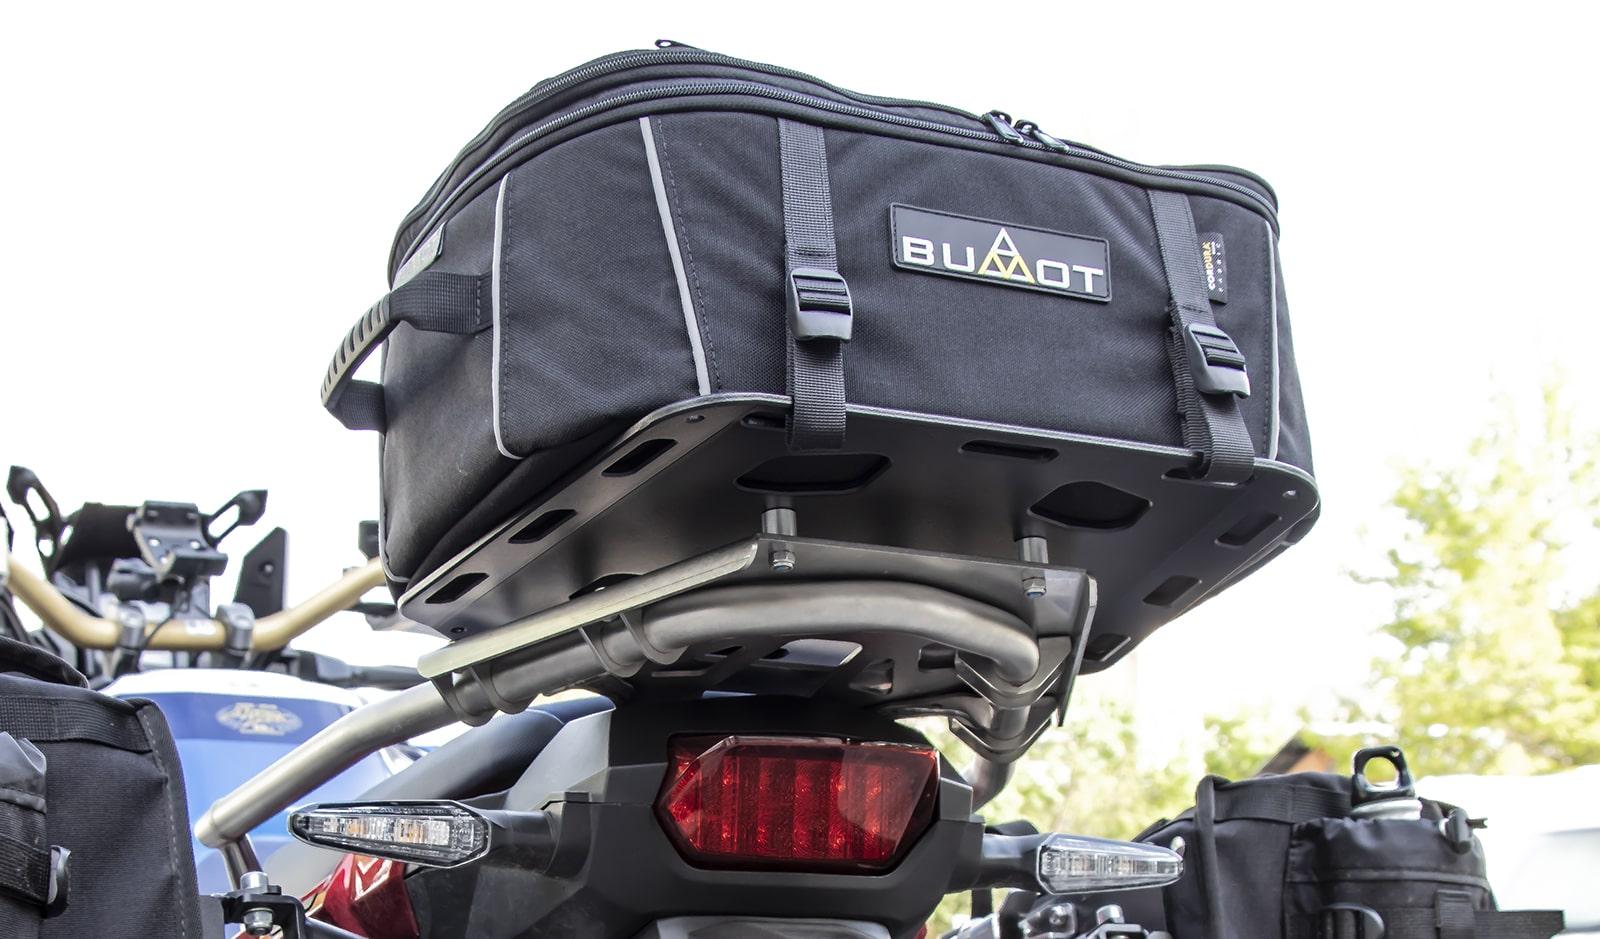 Soft luggage rear rack ATAS